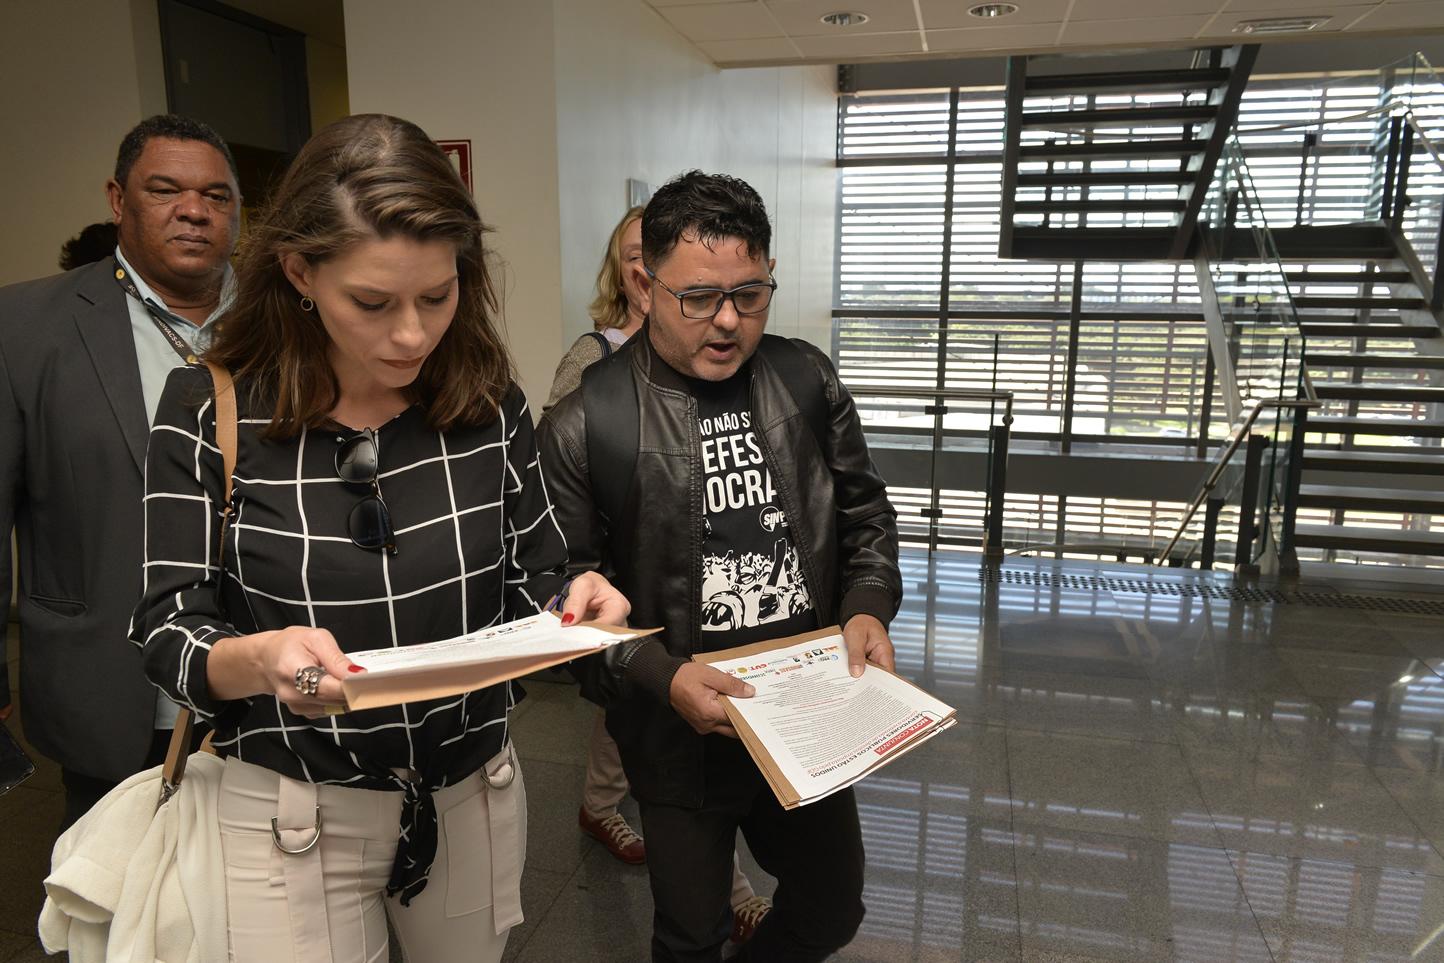 2019.06.13_Visita-aos-gabinetes-contra-o-fim-da-licenca-premio_fotos-Deva-Garcia-27